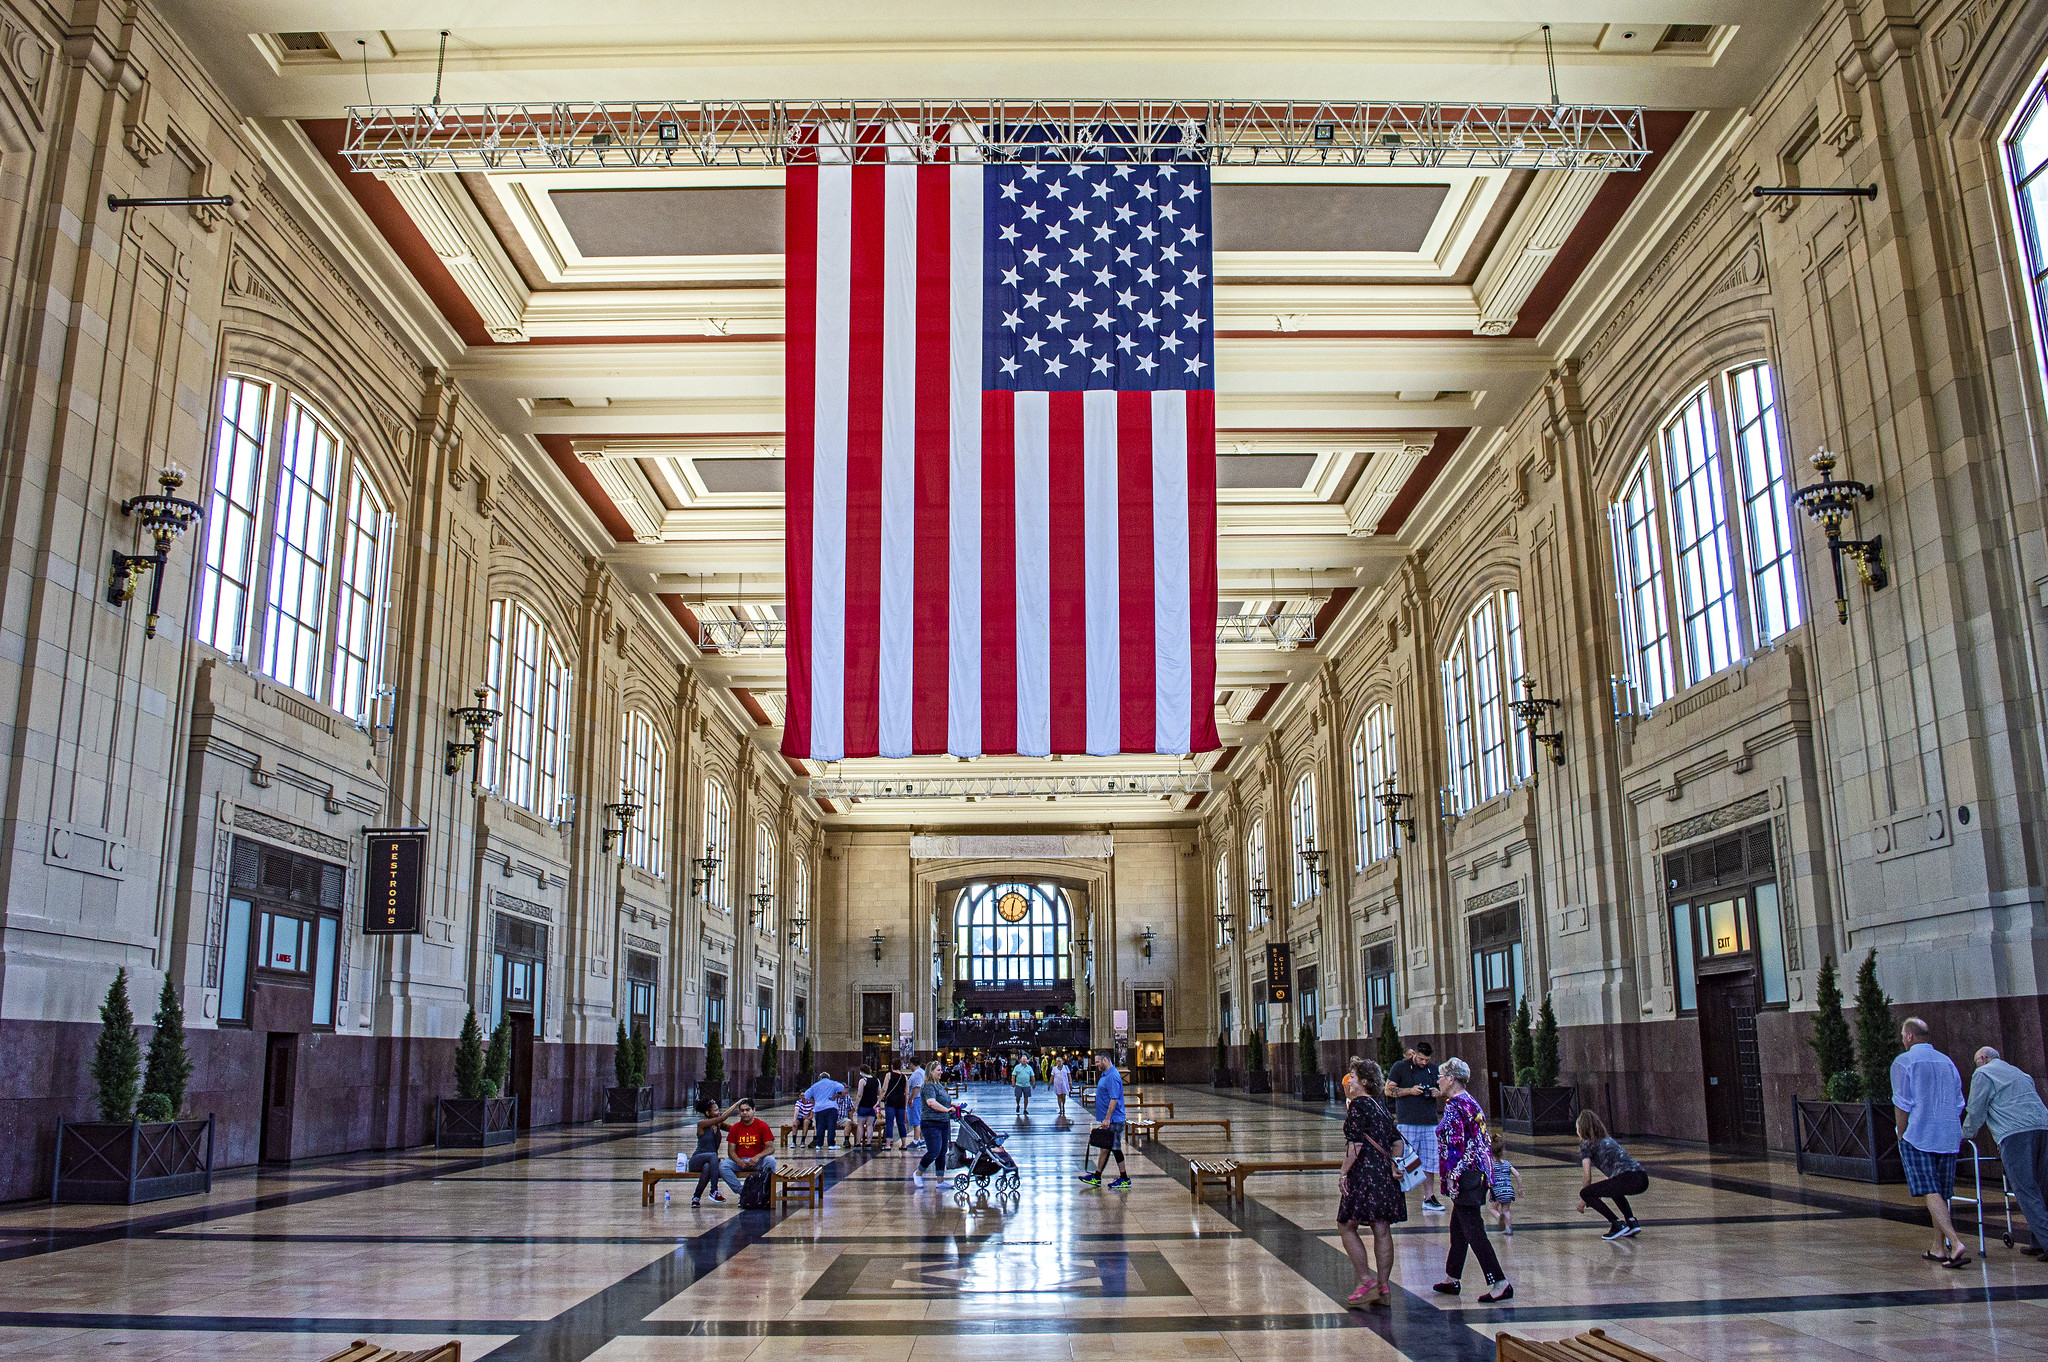 Old Glory at Union Station, Kansas City